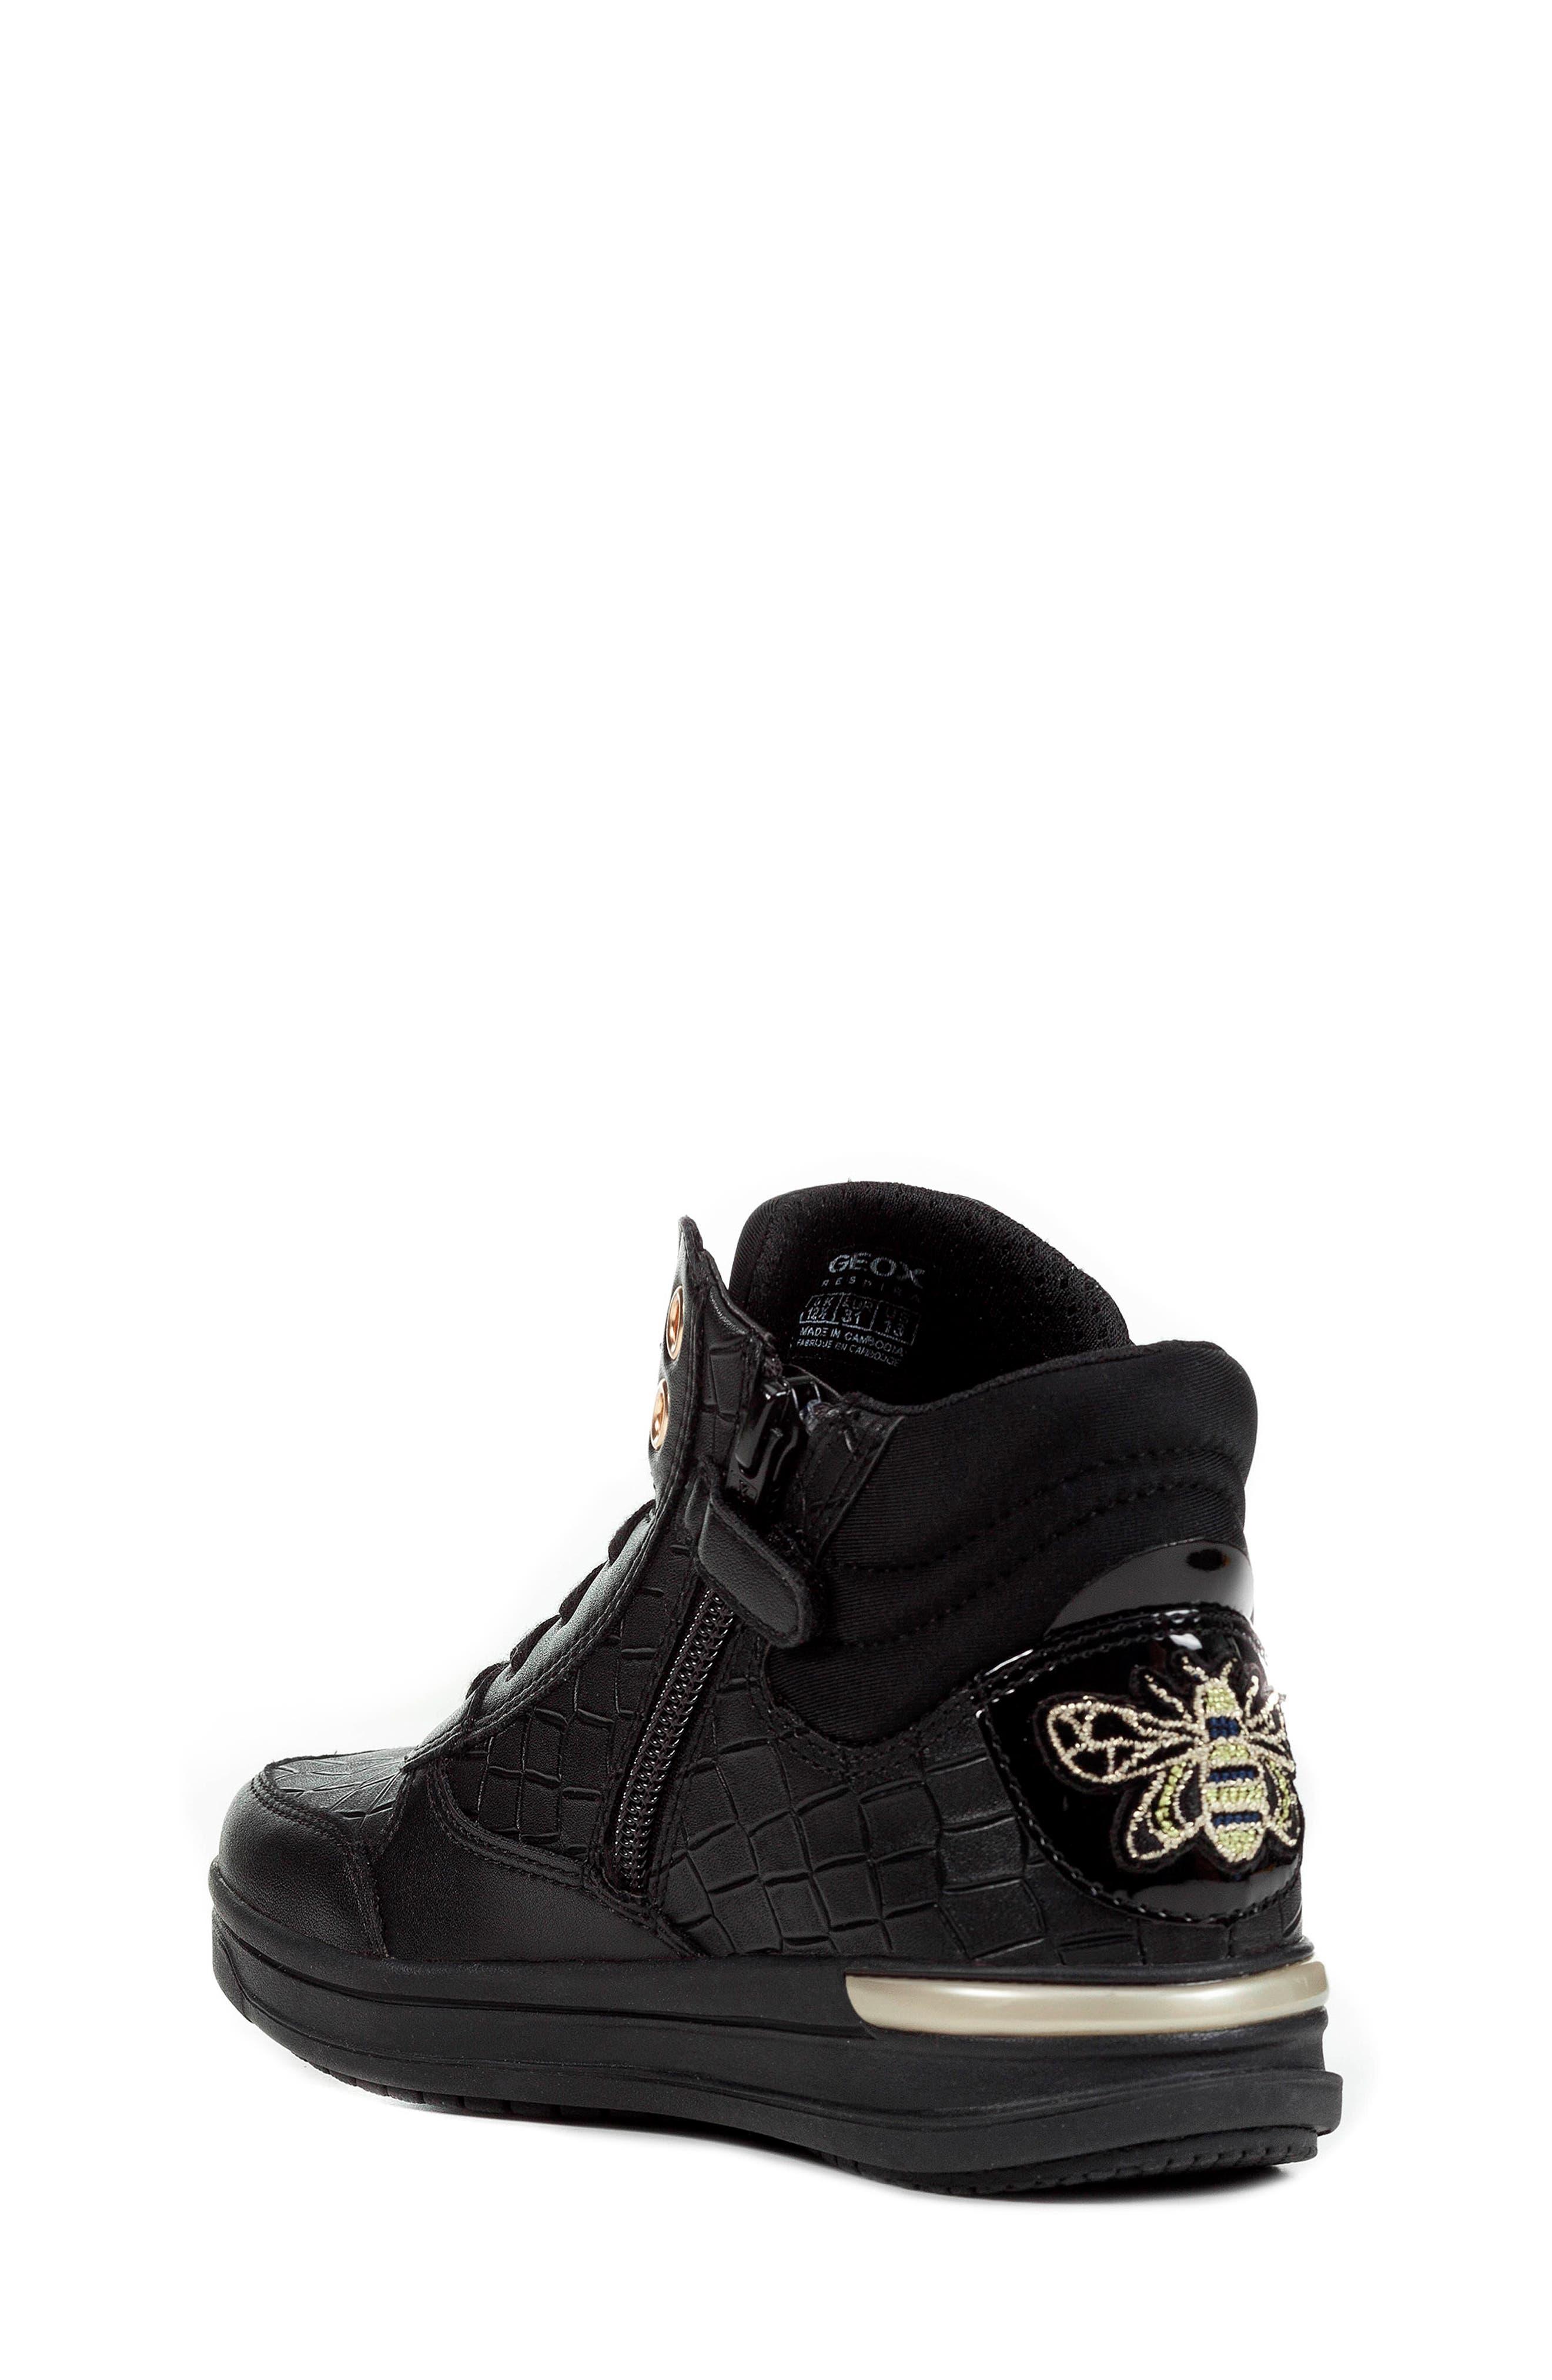 Aveup High Top Sneaker,                             Alternate thumbnail 2, color,                             BLACK